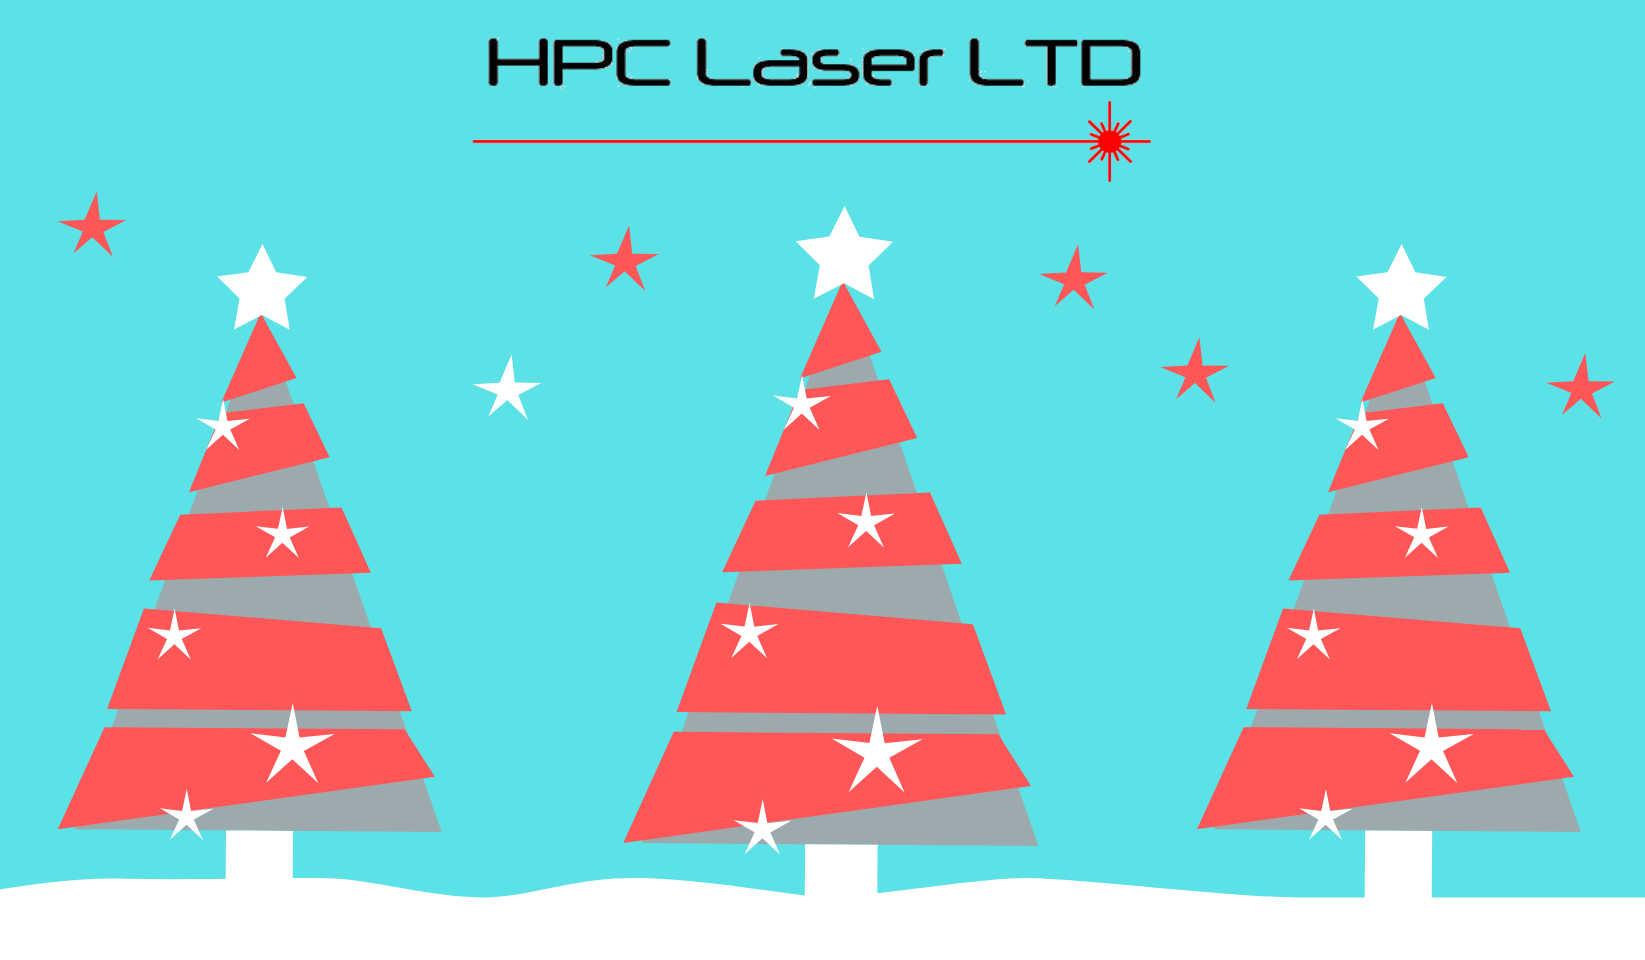 HPC Laser Christmas